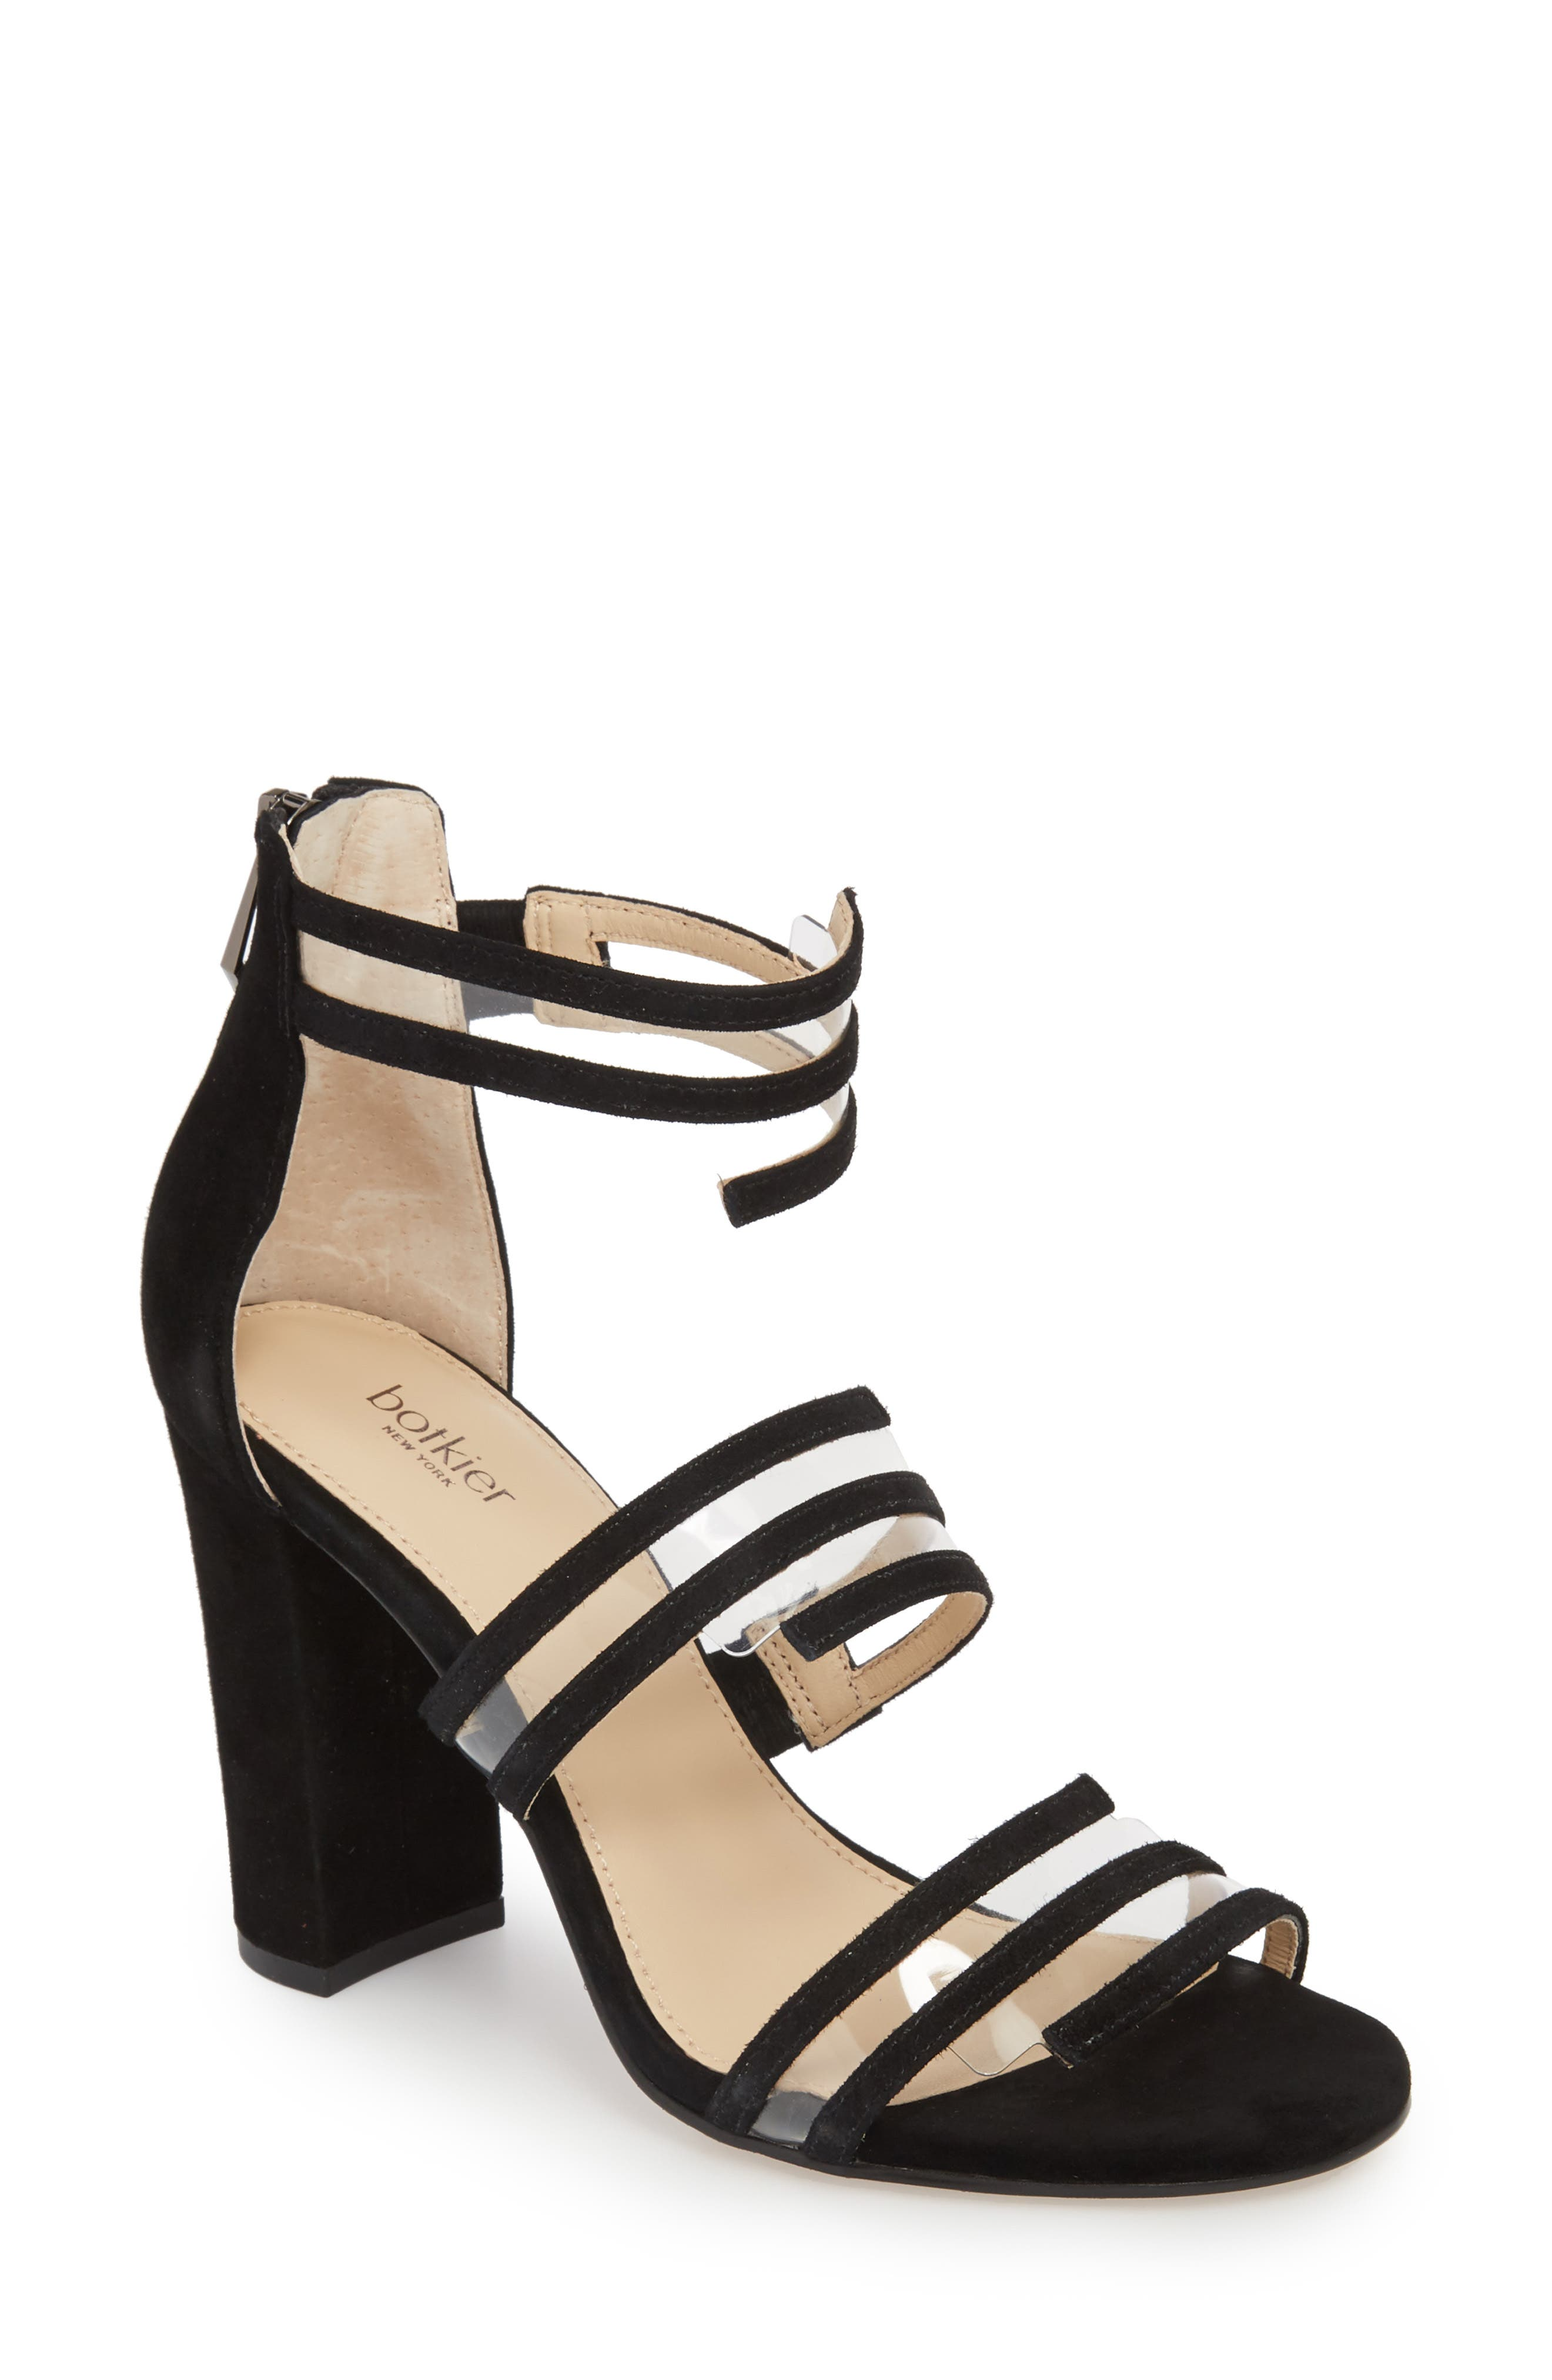 Grecia Sandal,                             Main thumbnail 1, color,                             BLACK SUEDE